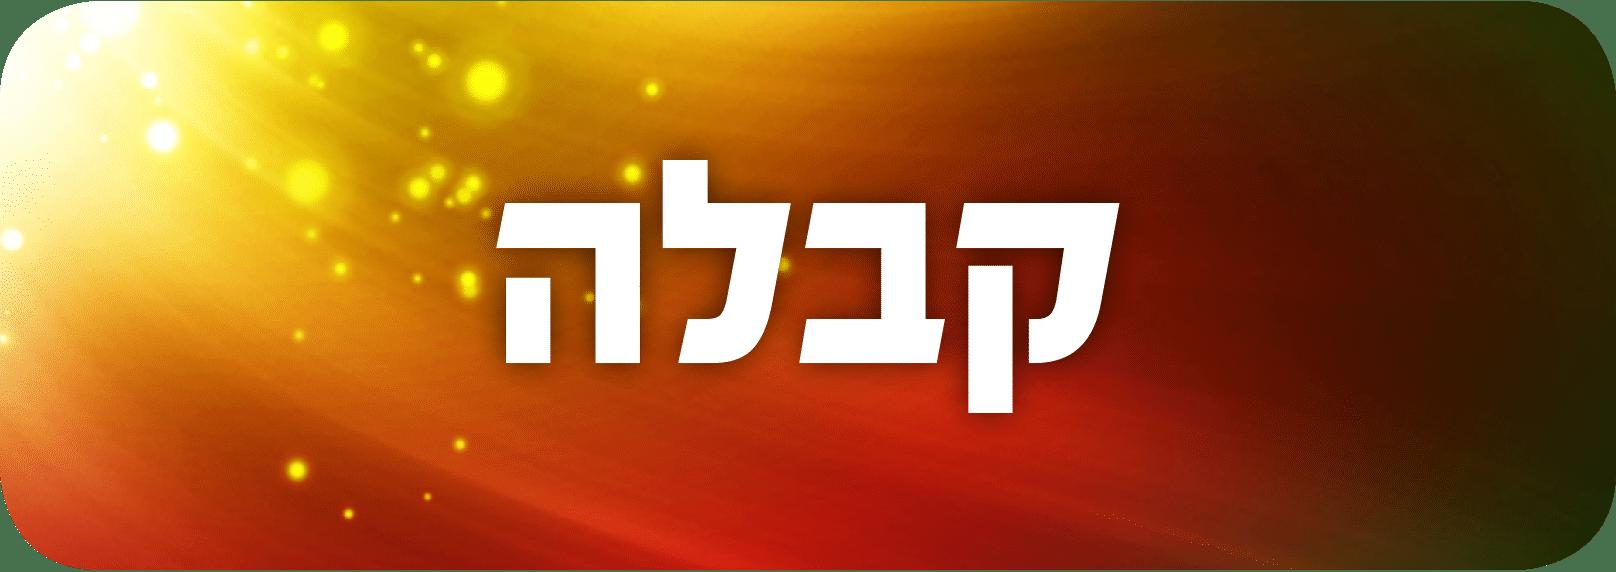 kabala bullet no logo